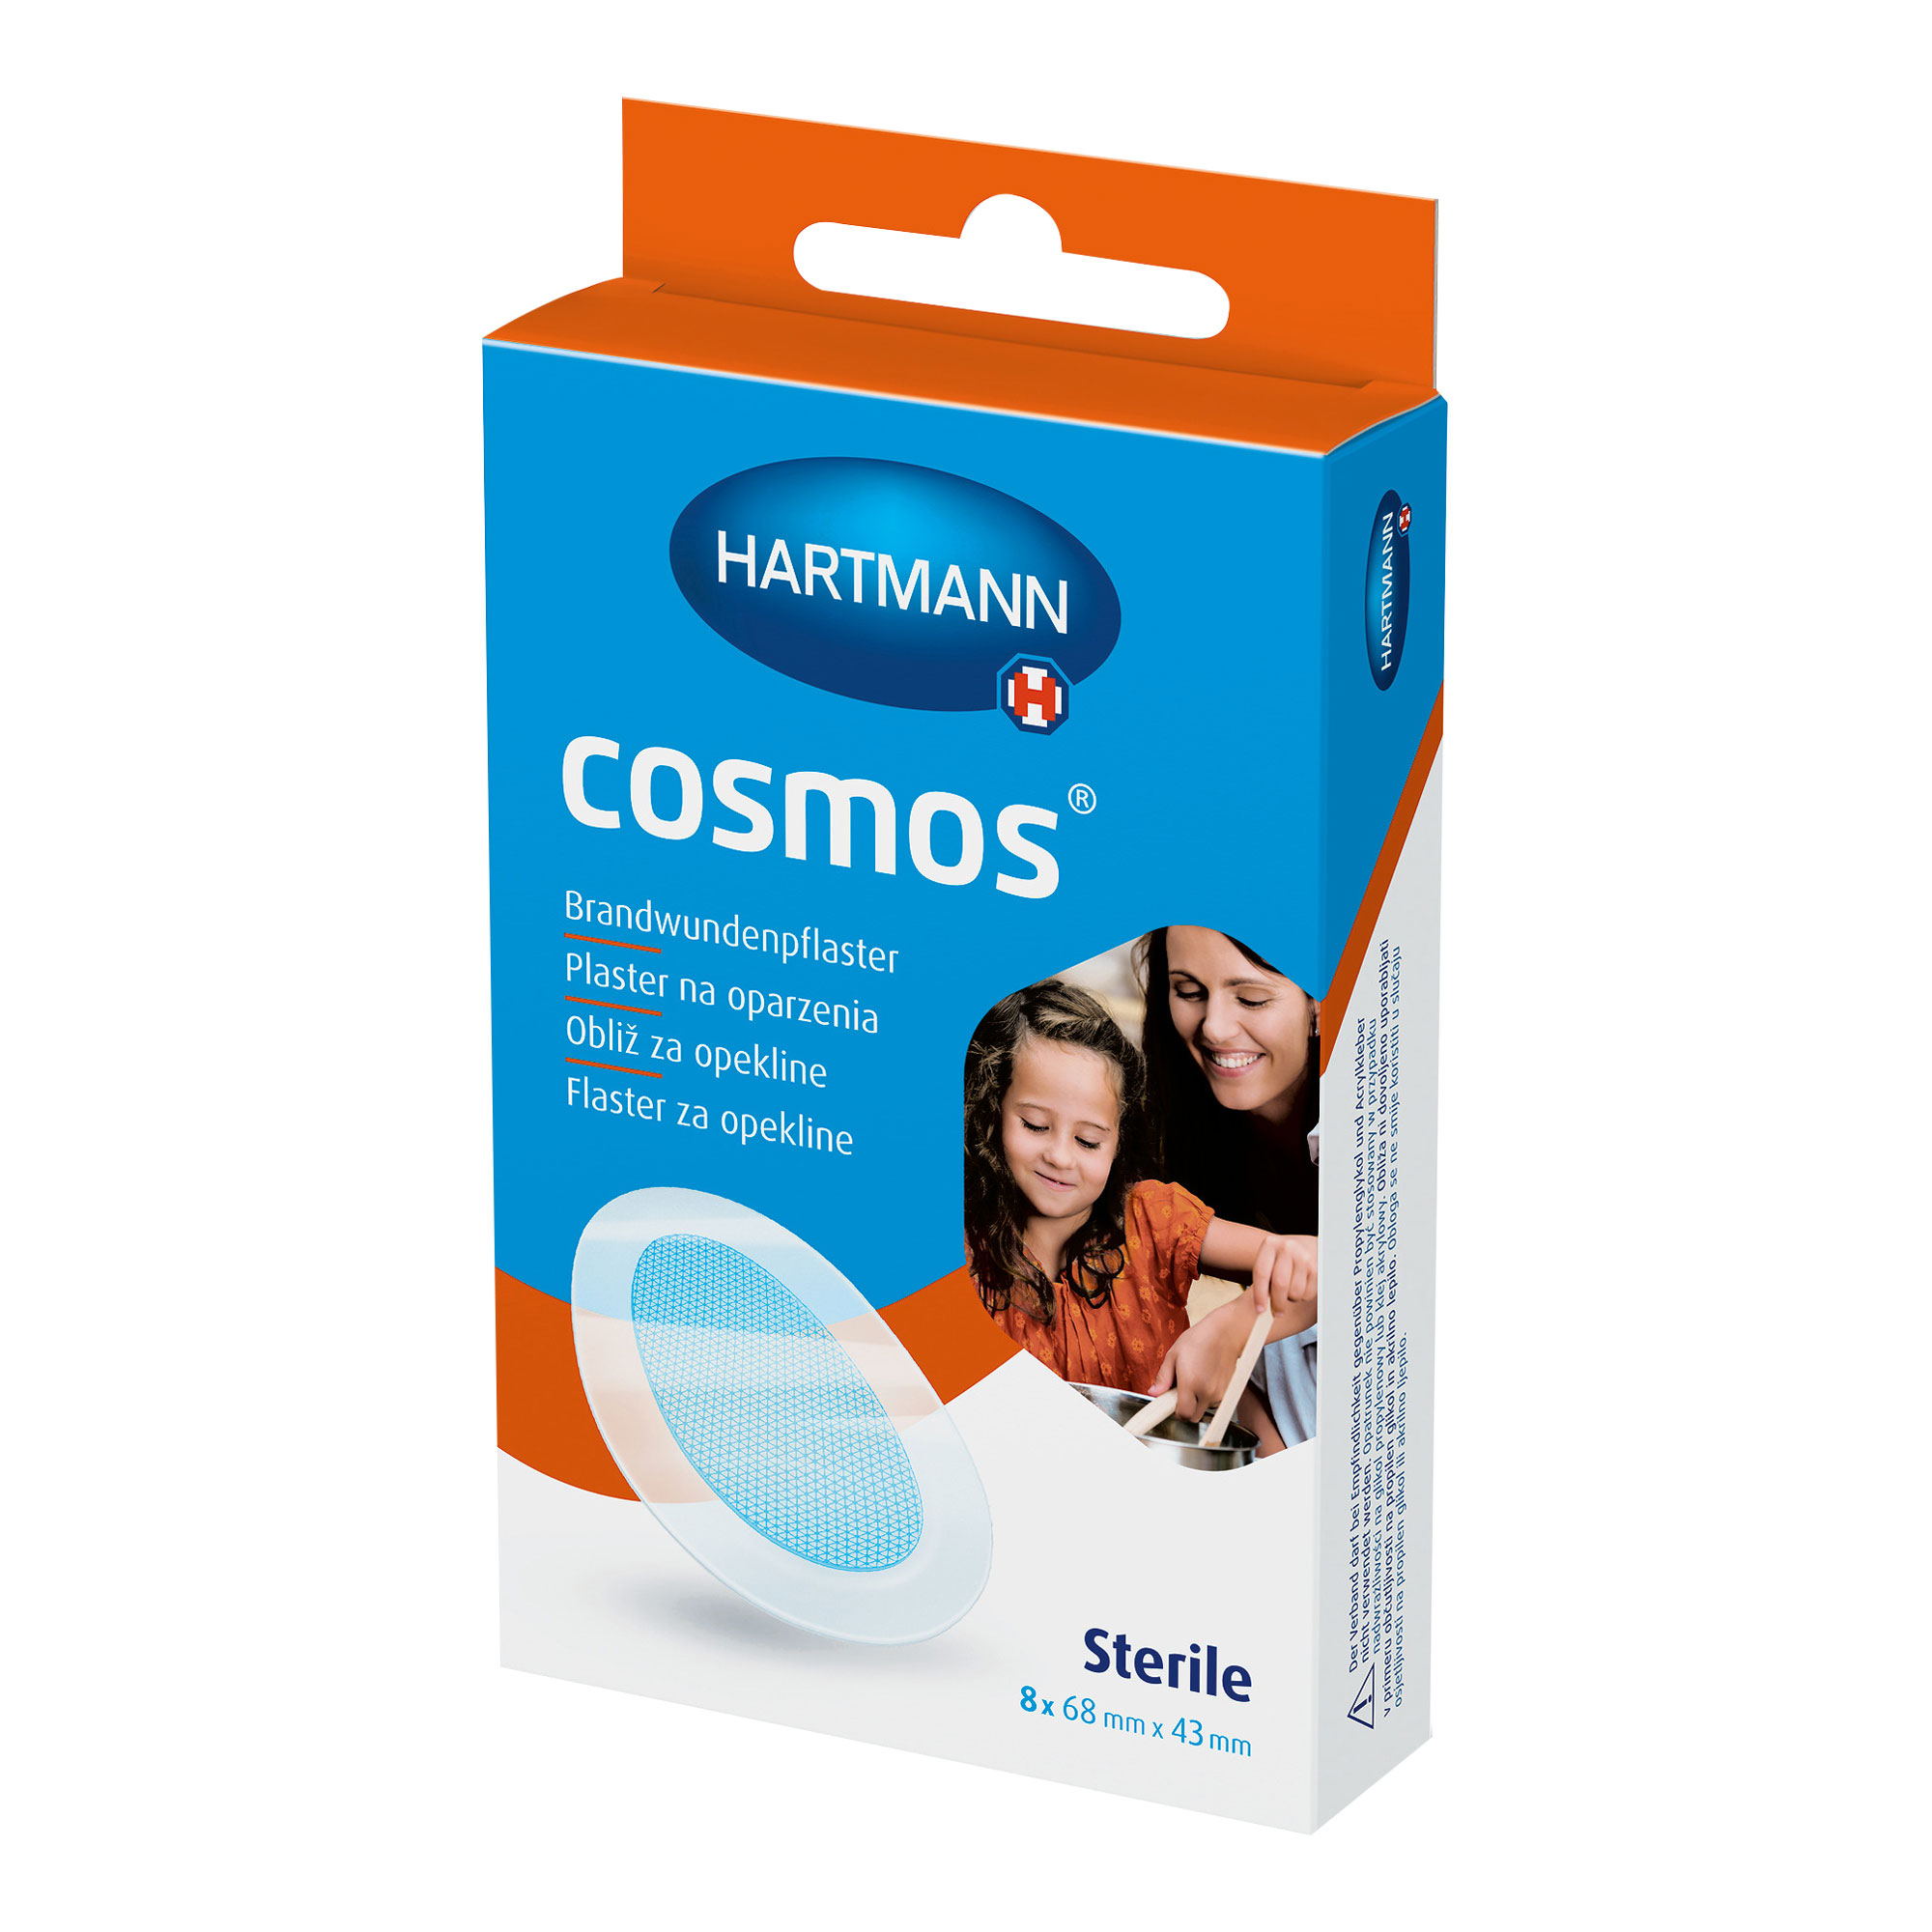 Cosmos Brandwundenpflaster 43x68 mm